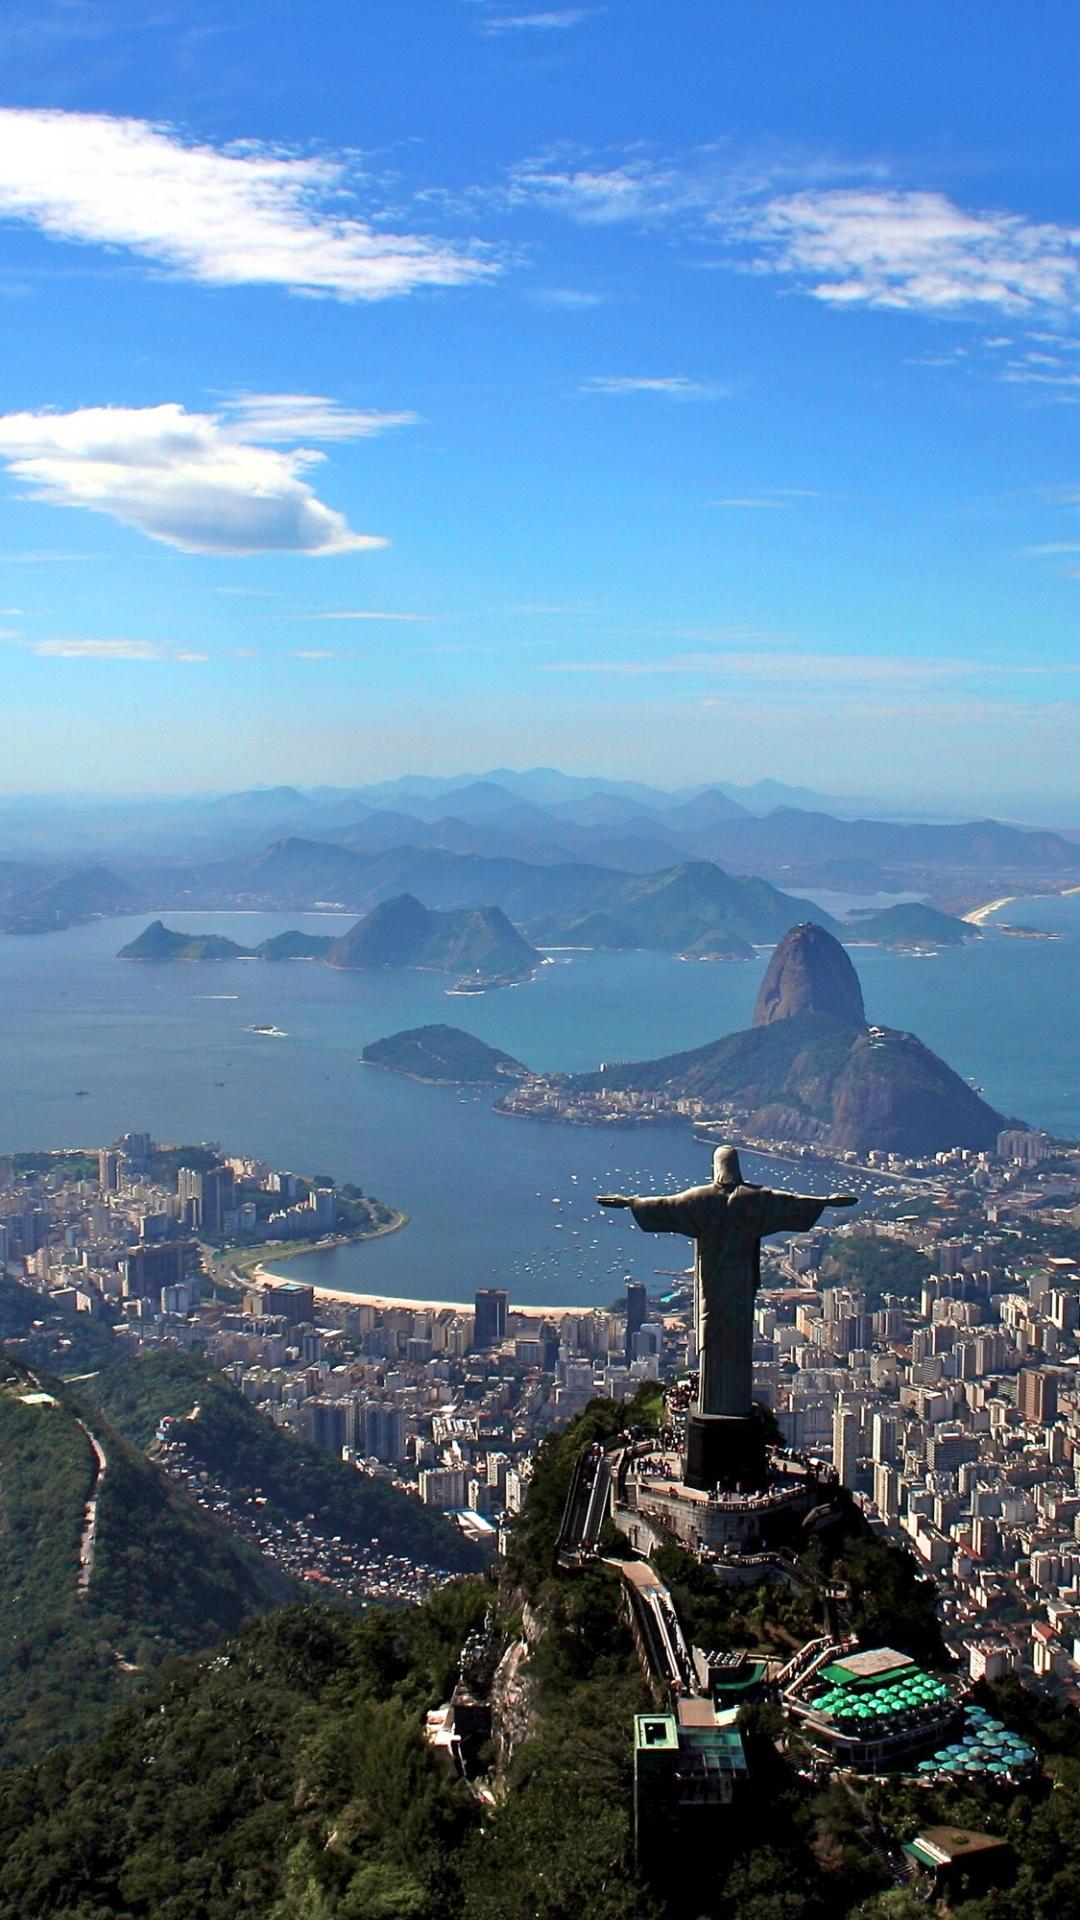 Mobile Rio De Janeiro Wallpaper Full HD Pictures 1080x1920